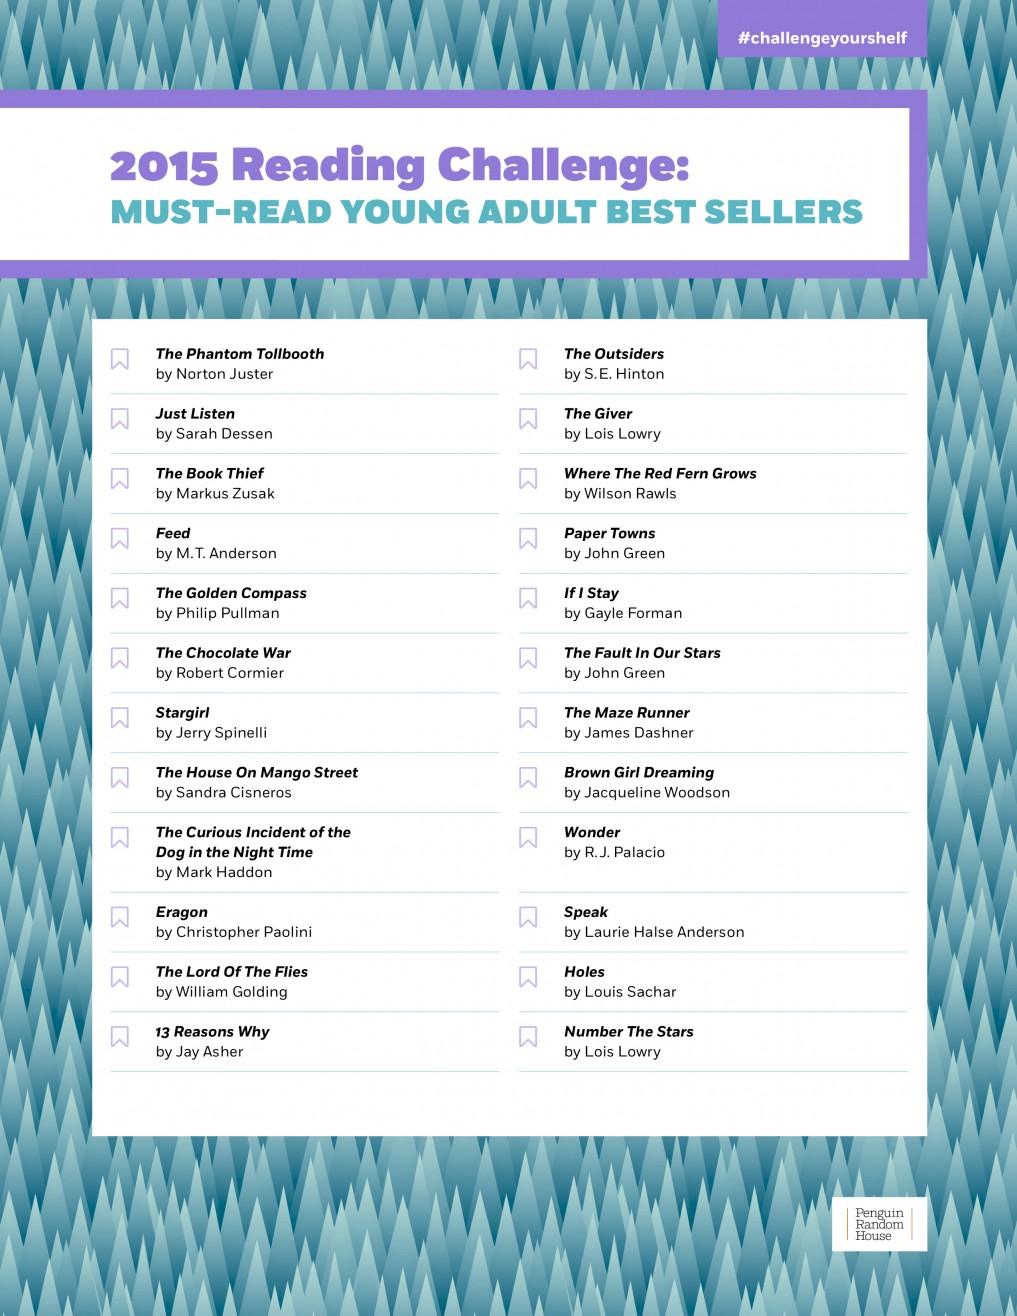 readingchallenge-must-read-ya-best-sellers